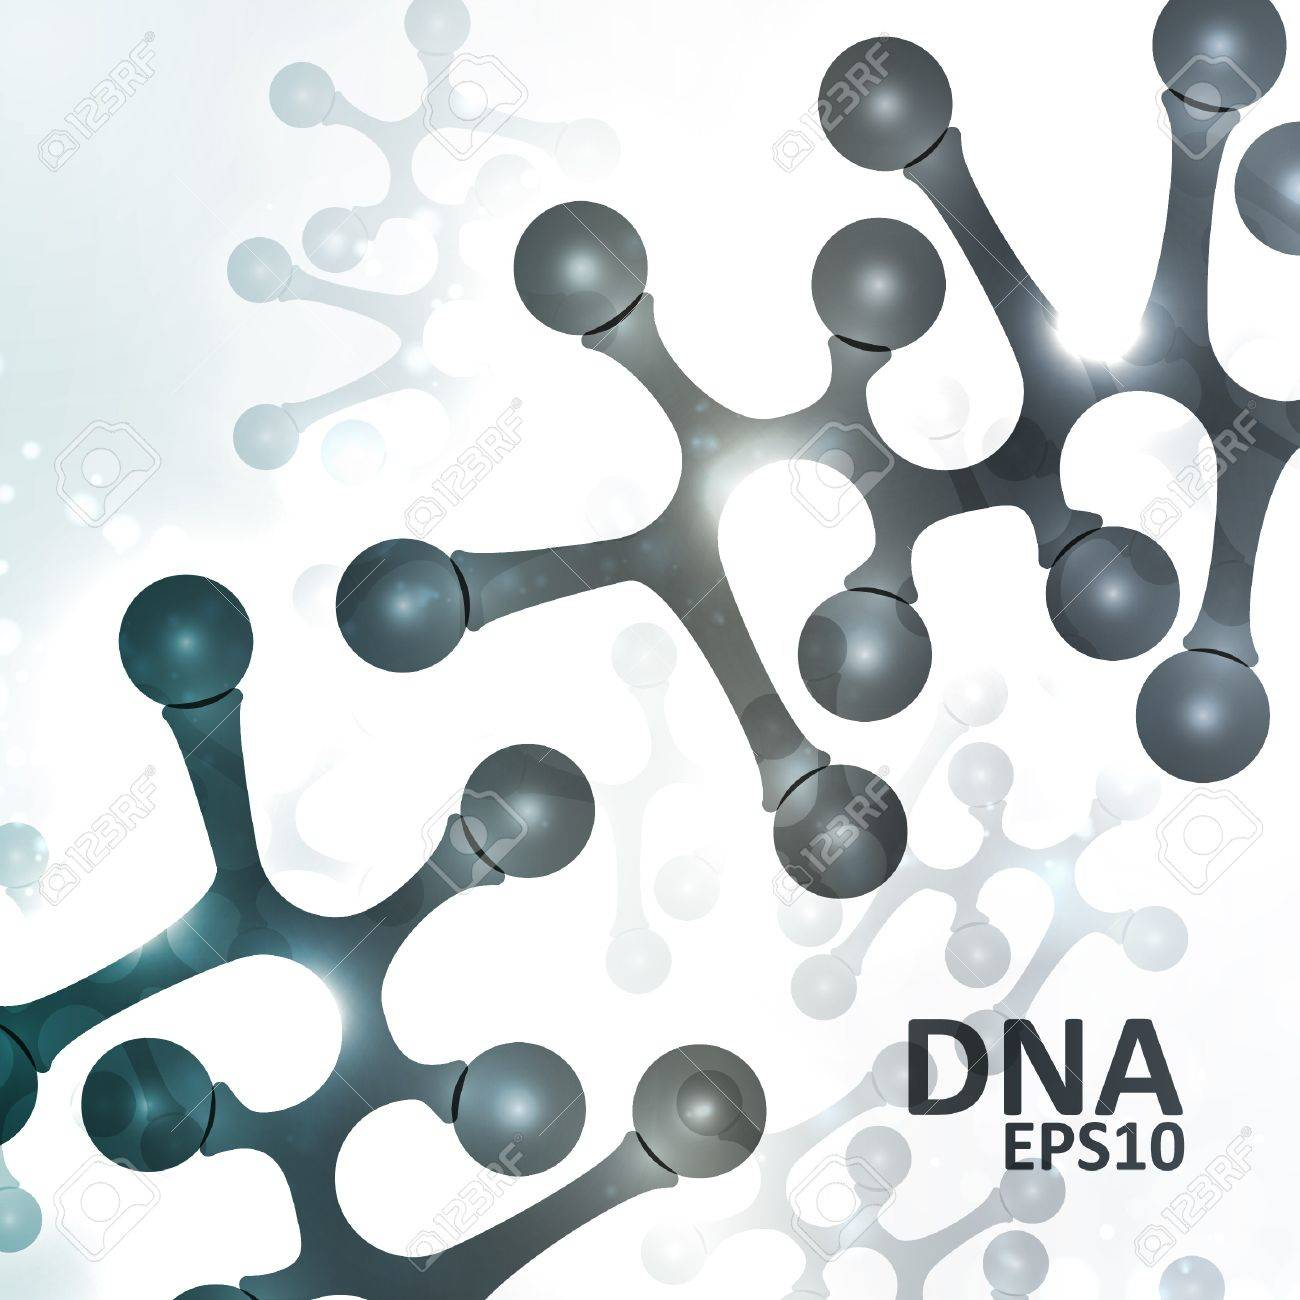 Futuristic dna, abstract molecule, cell illustration Stock Vector - 14975399